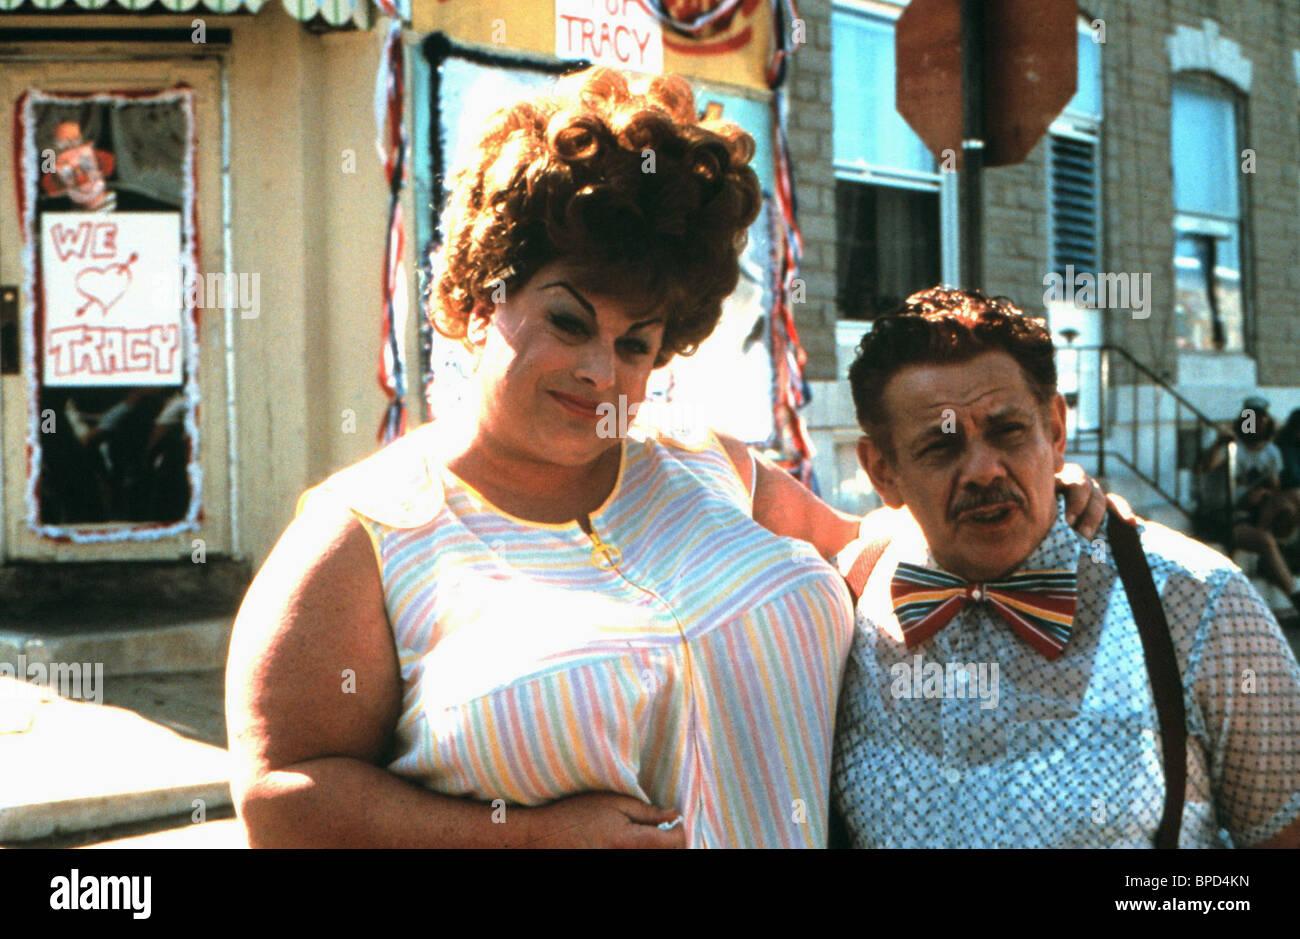 DEVINE & SONNY BONO HAIRSPRAY (1988 Stock Photo, Royalty ...